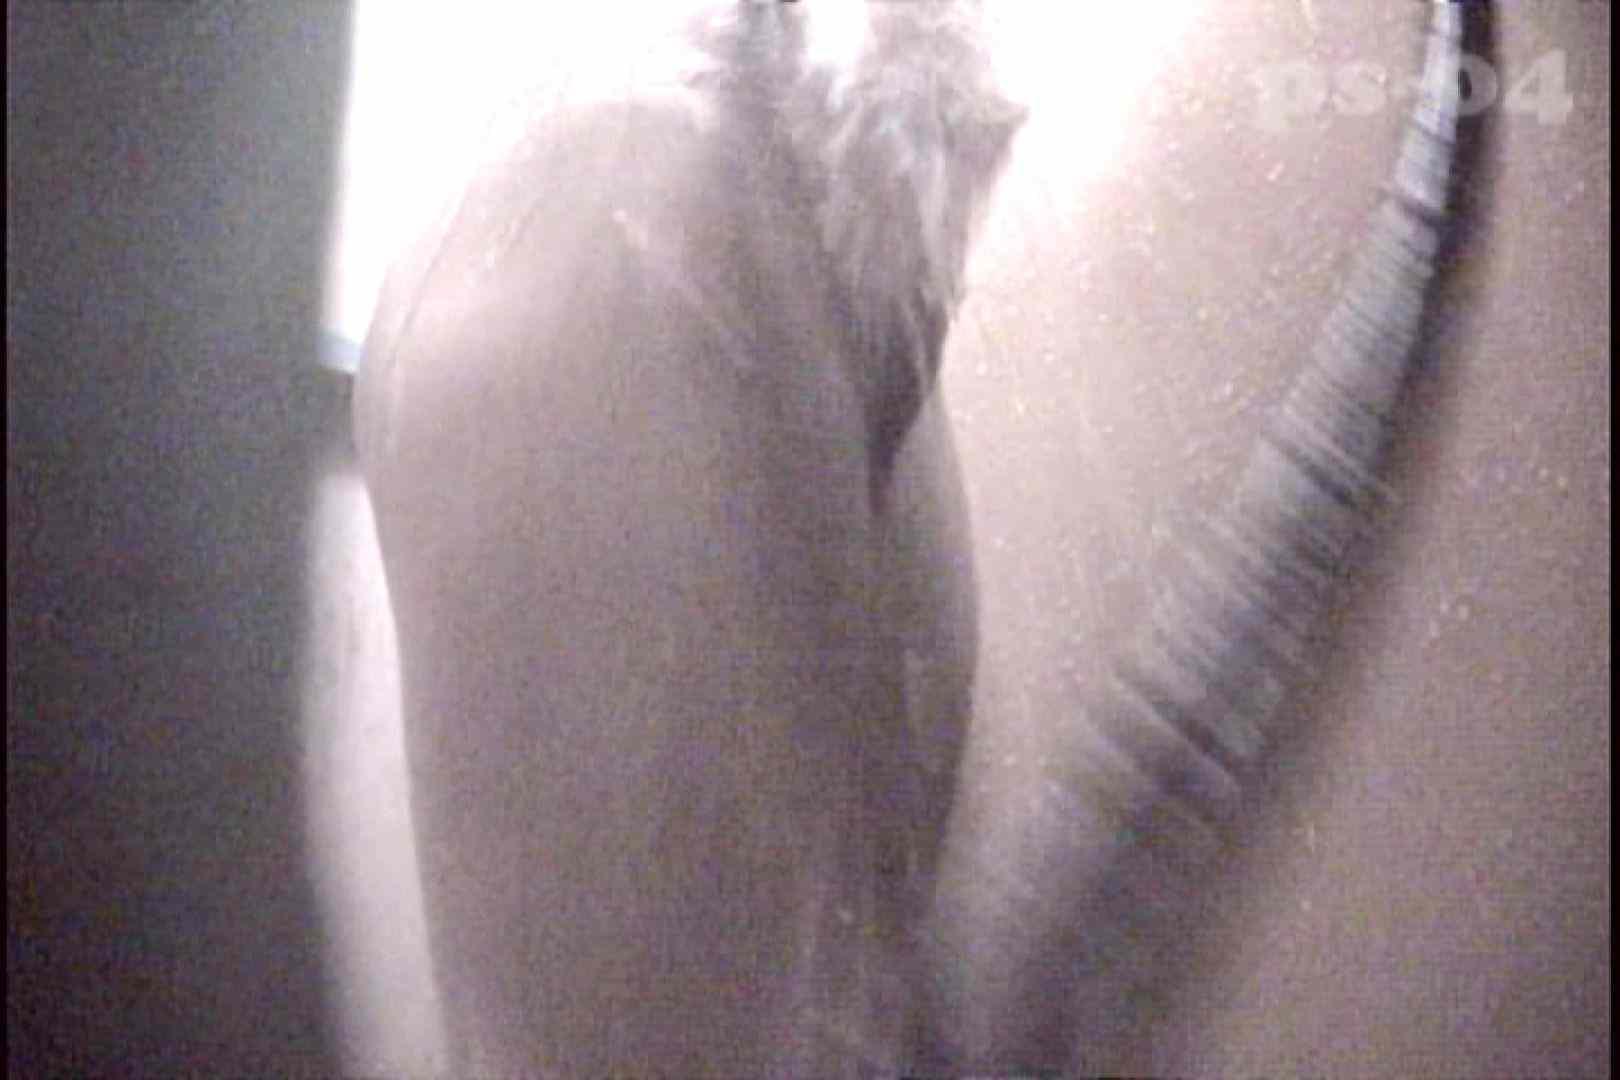 File.28 貧乳好きにはたまりません! 可愛い貧乳 | シャワー中  34連発